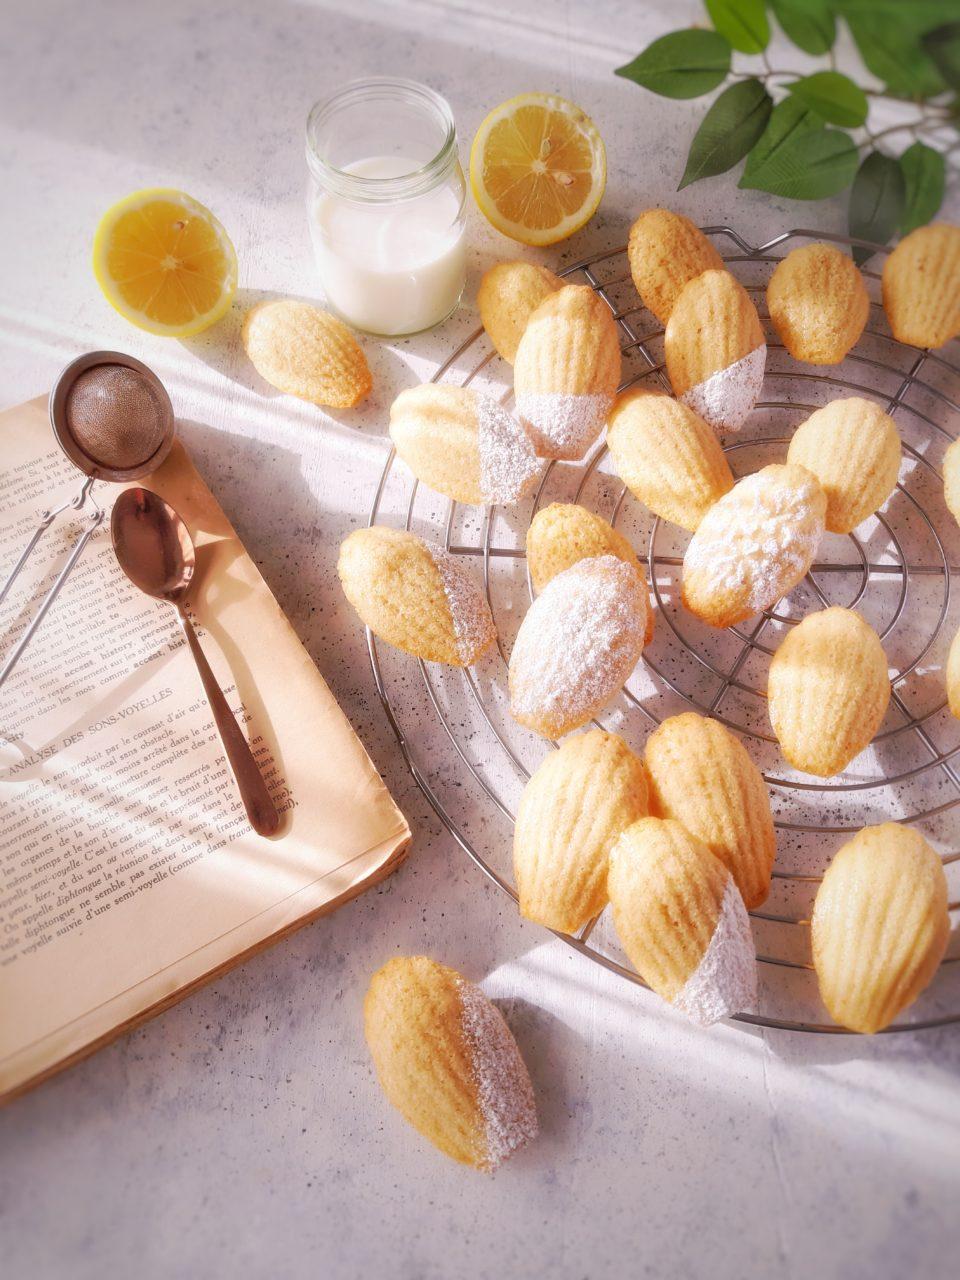 (Italiano) Madeleines al limone e mandorle